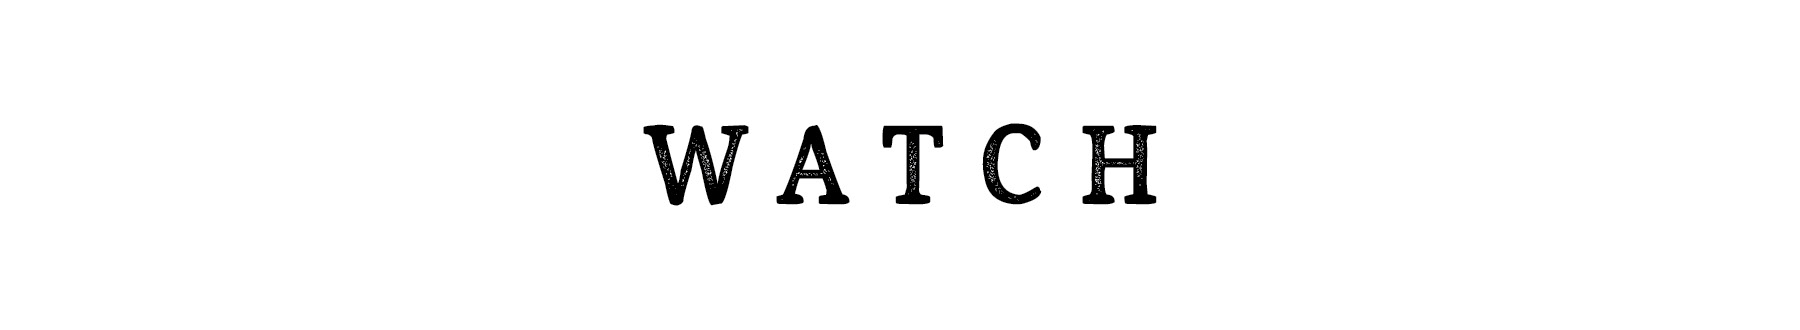 MUSIC_Watch.jpg